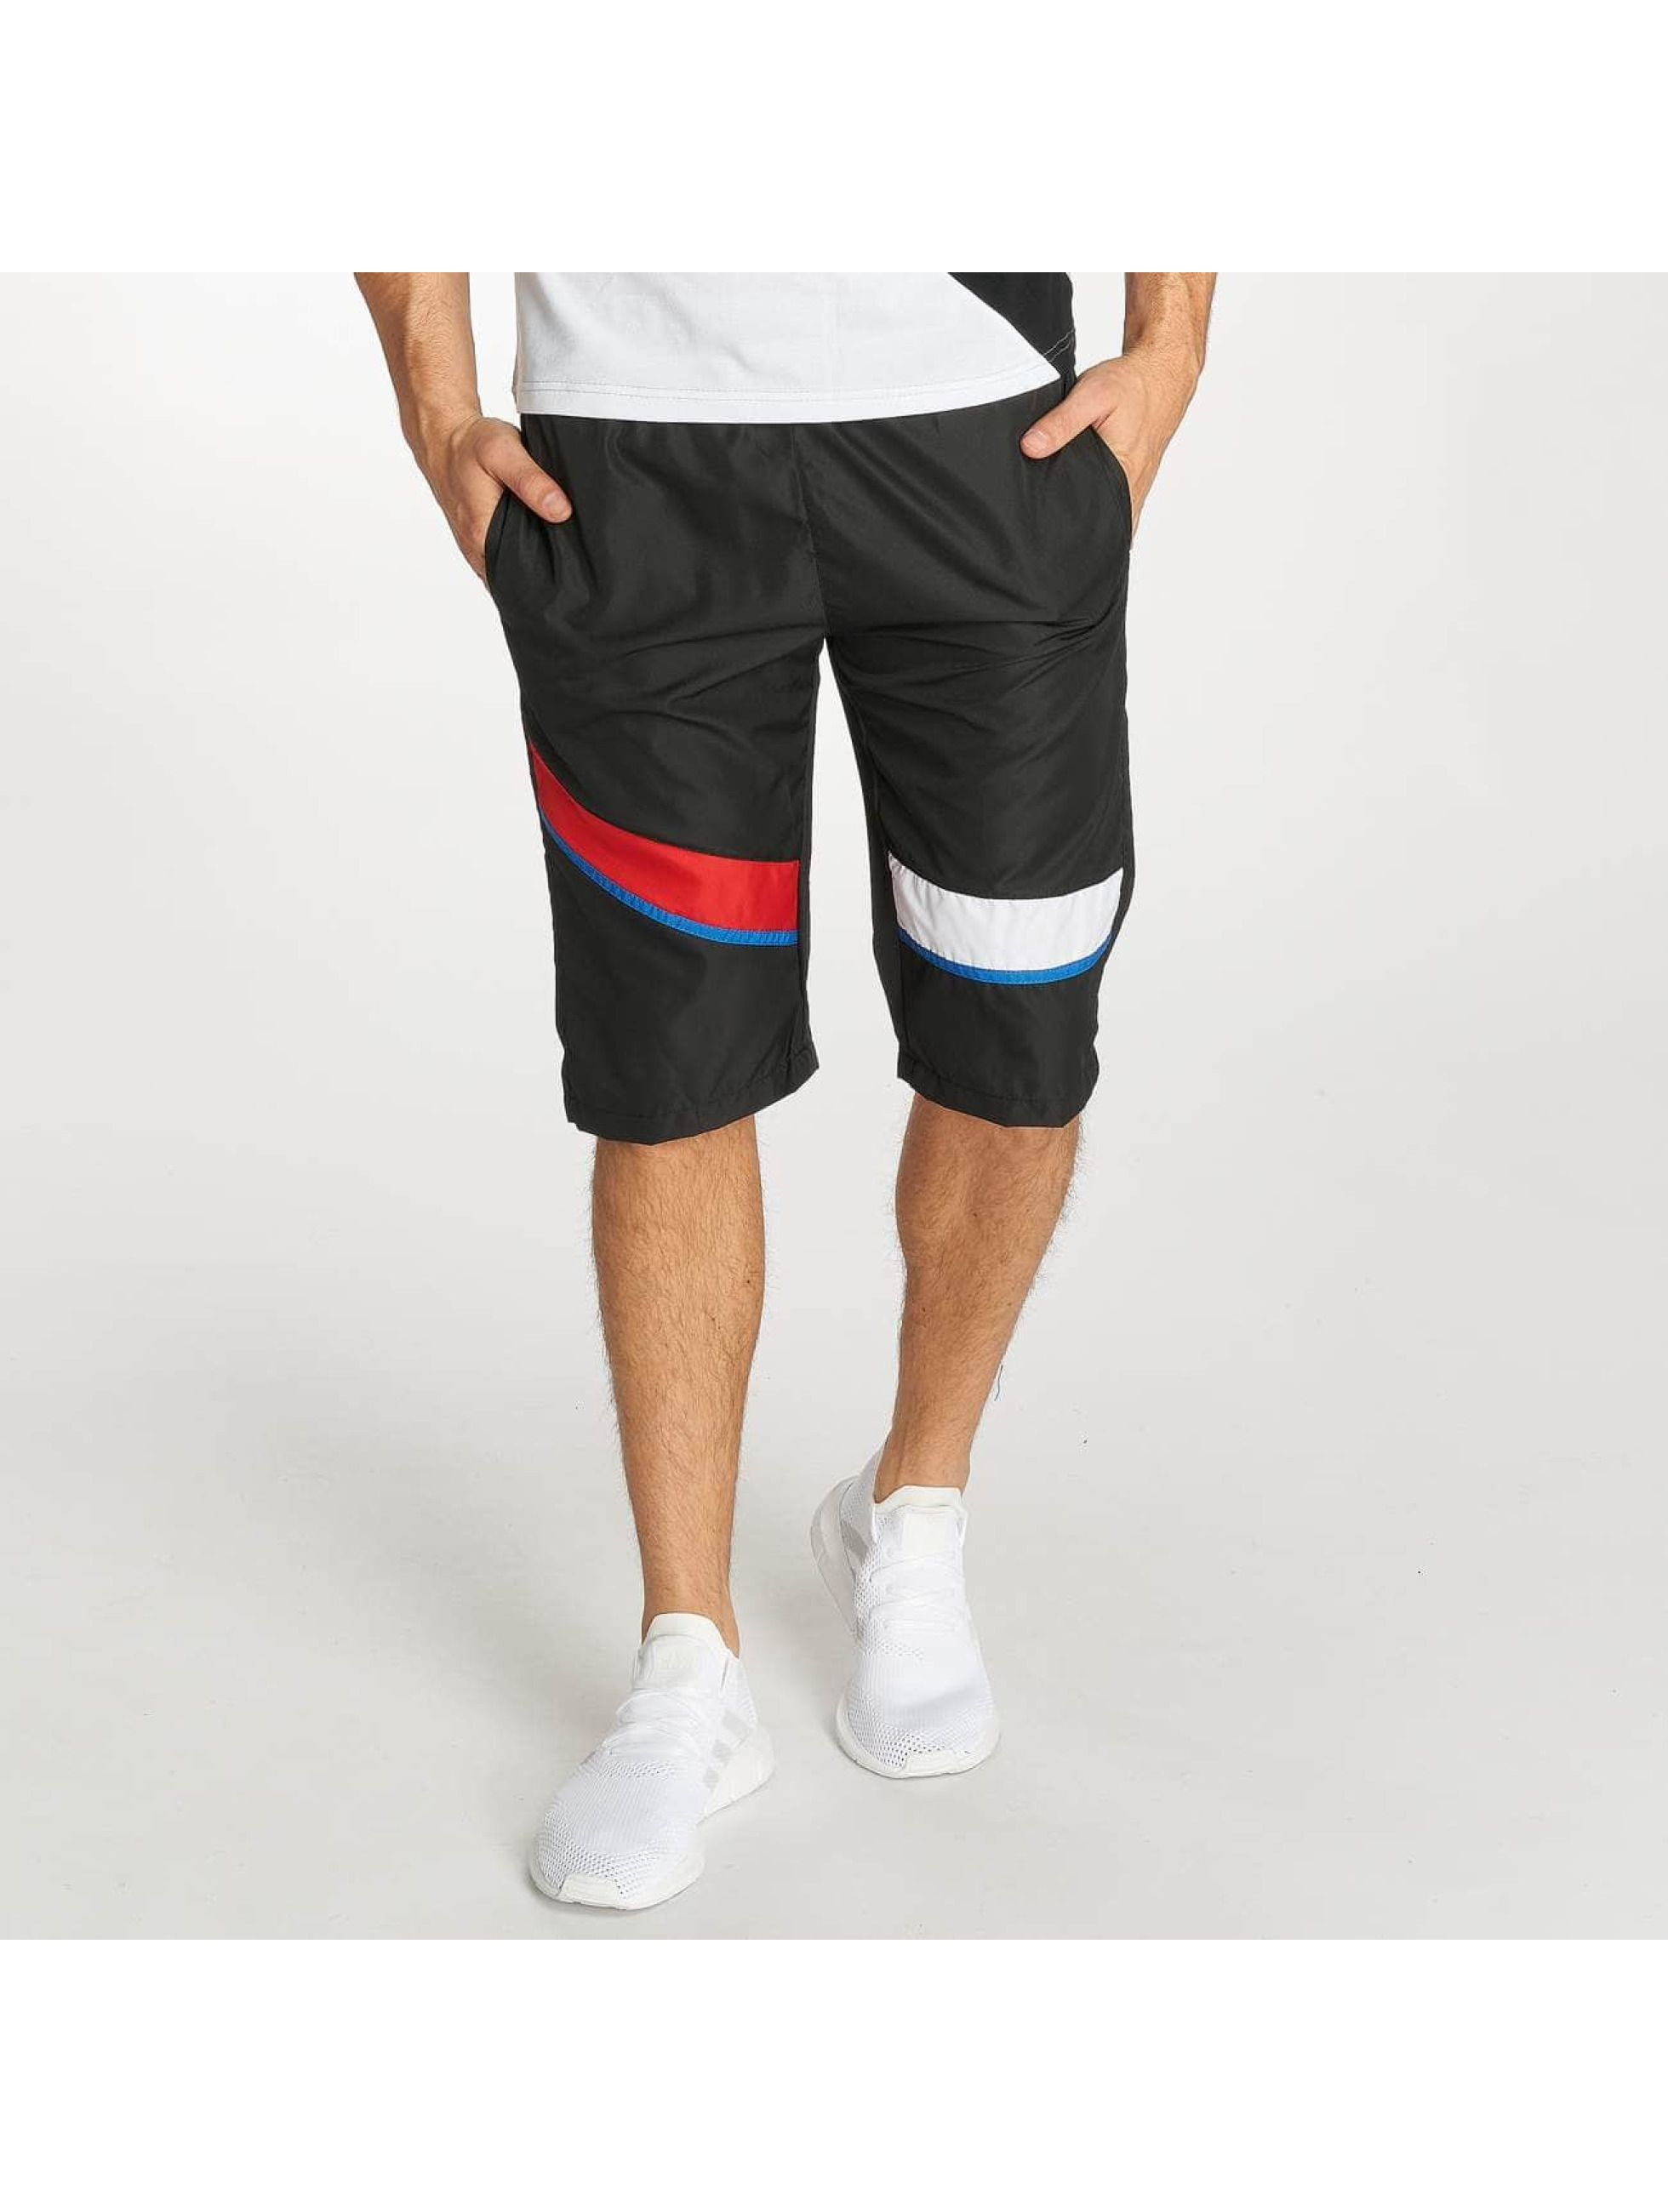 Zayne Paris Shorts Stripe schwarz